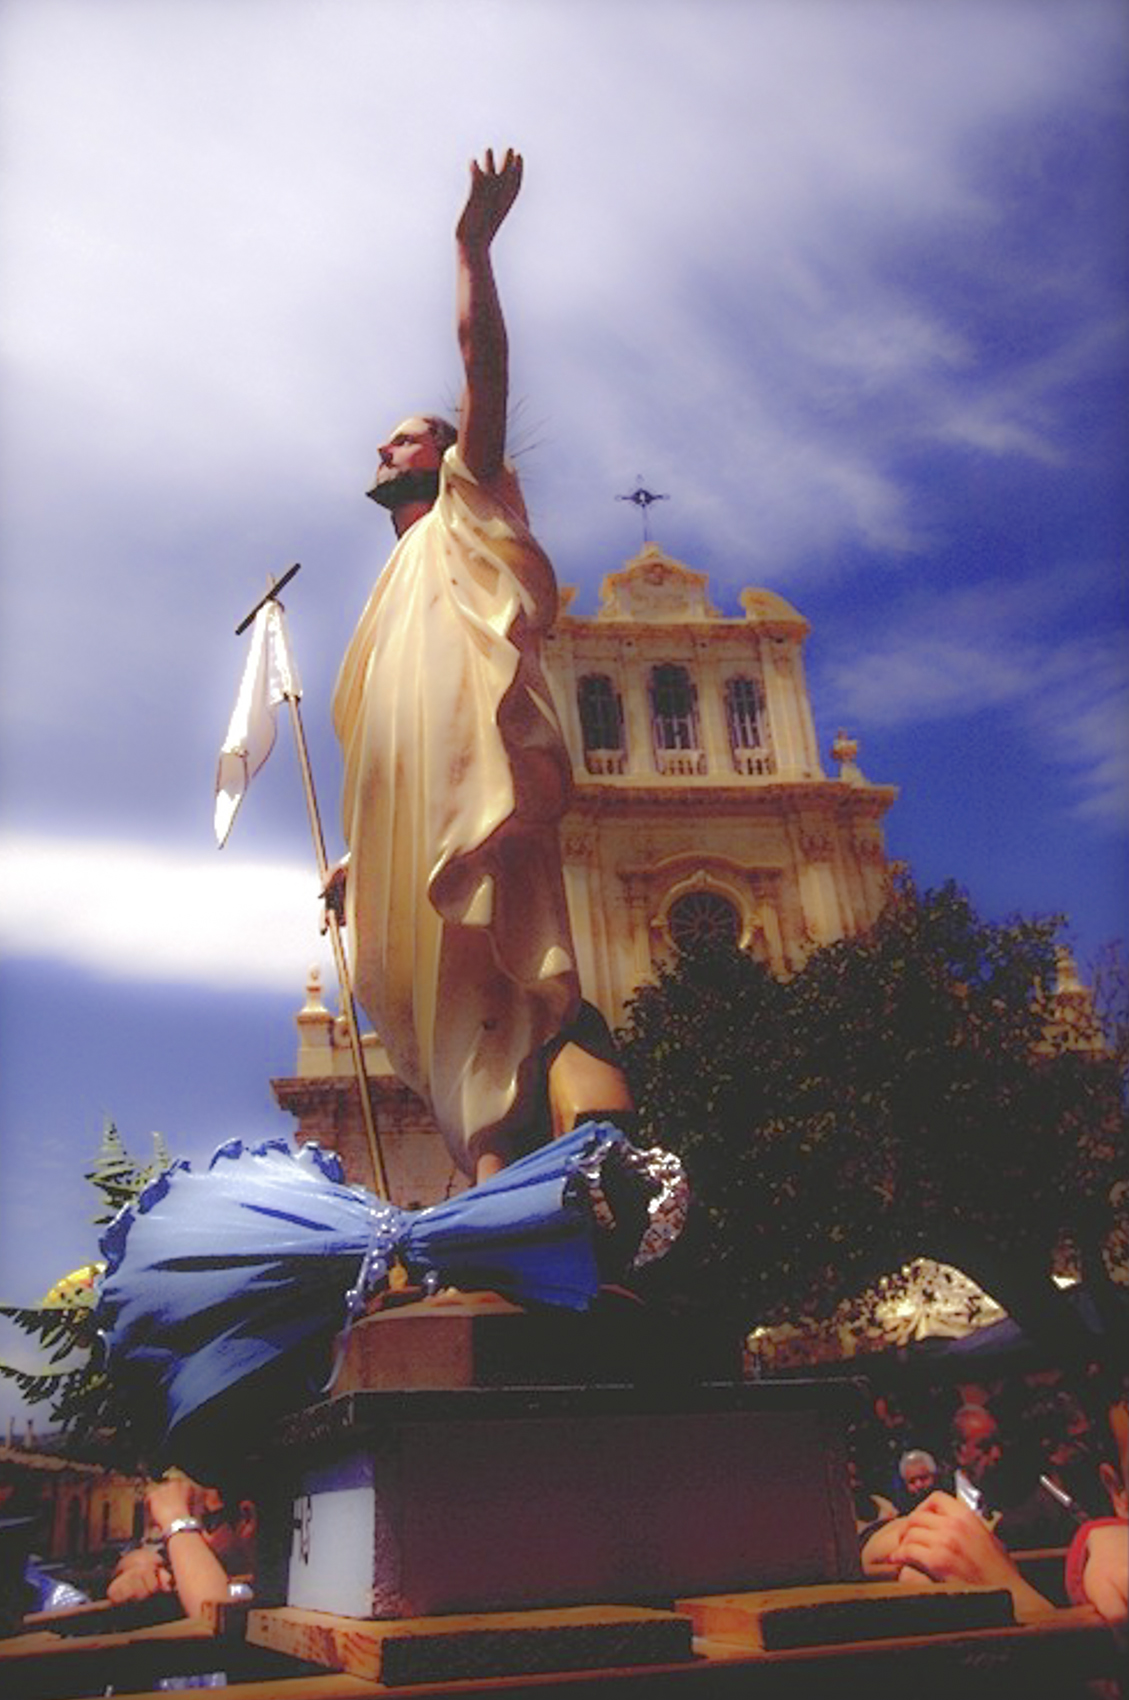 Fiesta of San Sabastian, Sicily